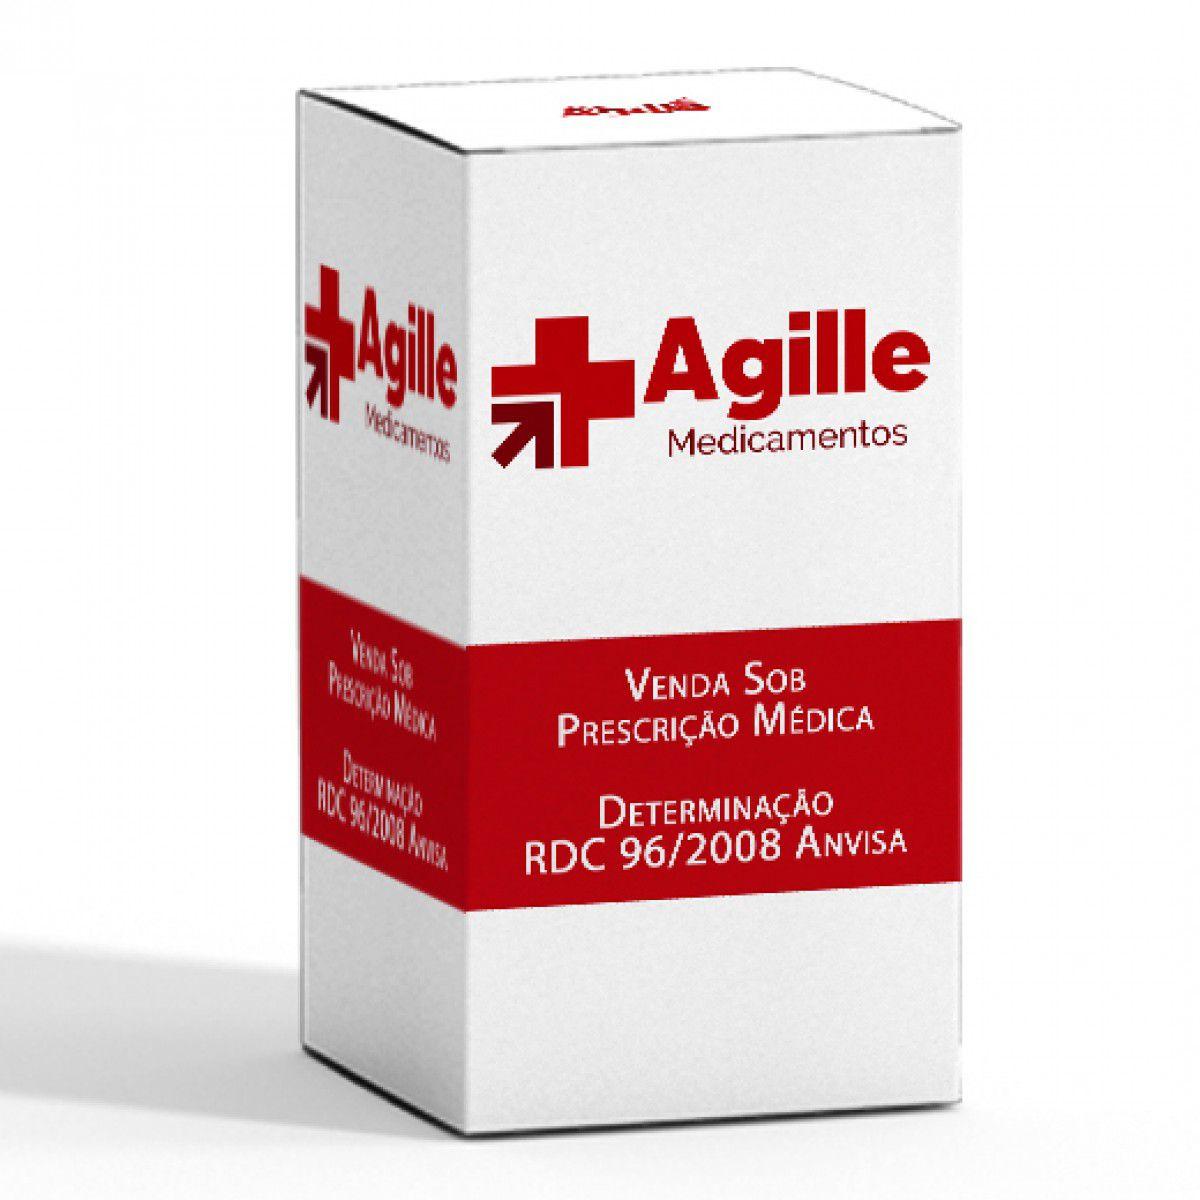 CLORIDRATO DE CINACALCETE 60MG CX 30CAMP REV  - Agille Speciality